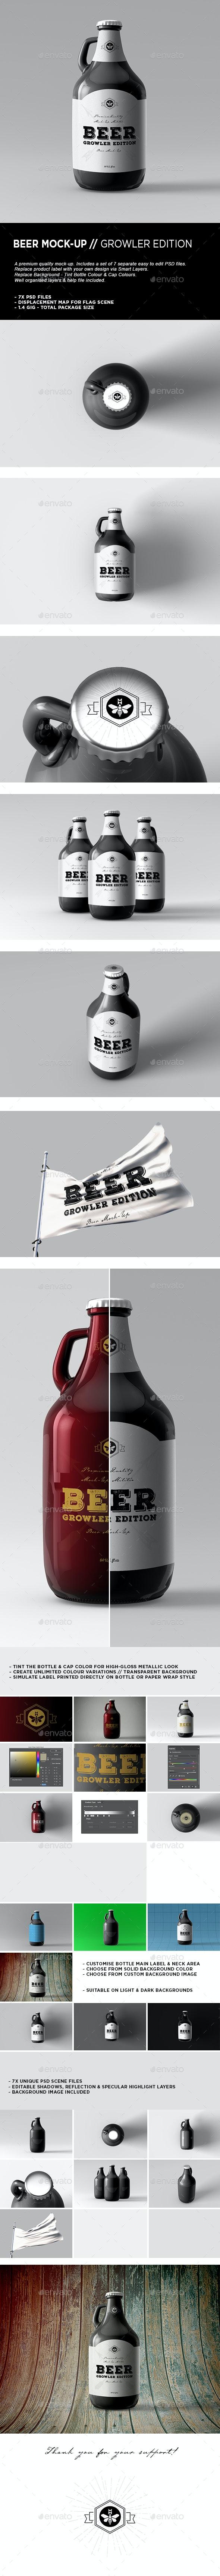 Beer Mock-Up   Growler Bottle Mock-Up - Food and Drink Packaging